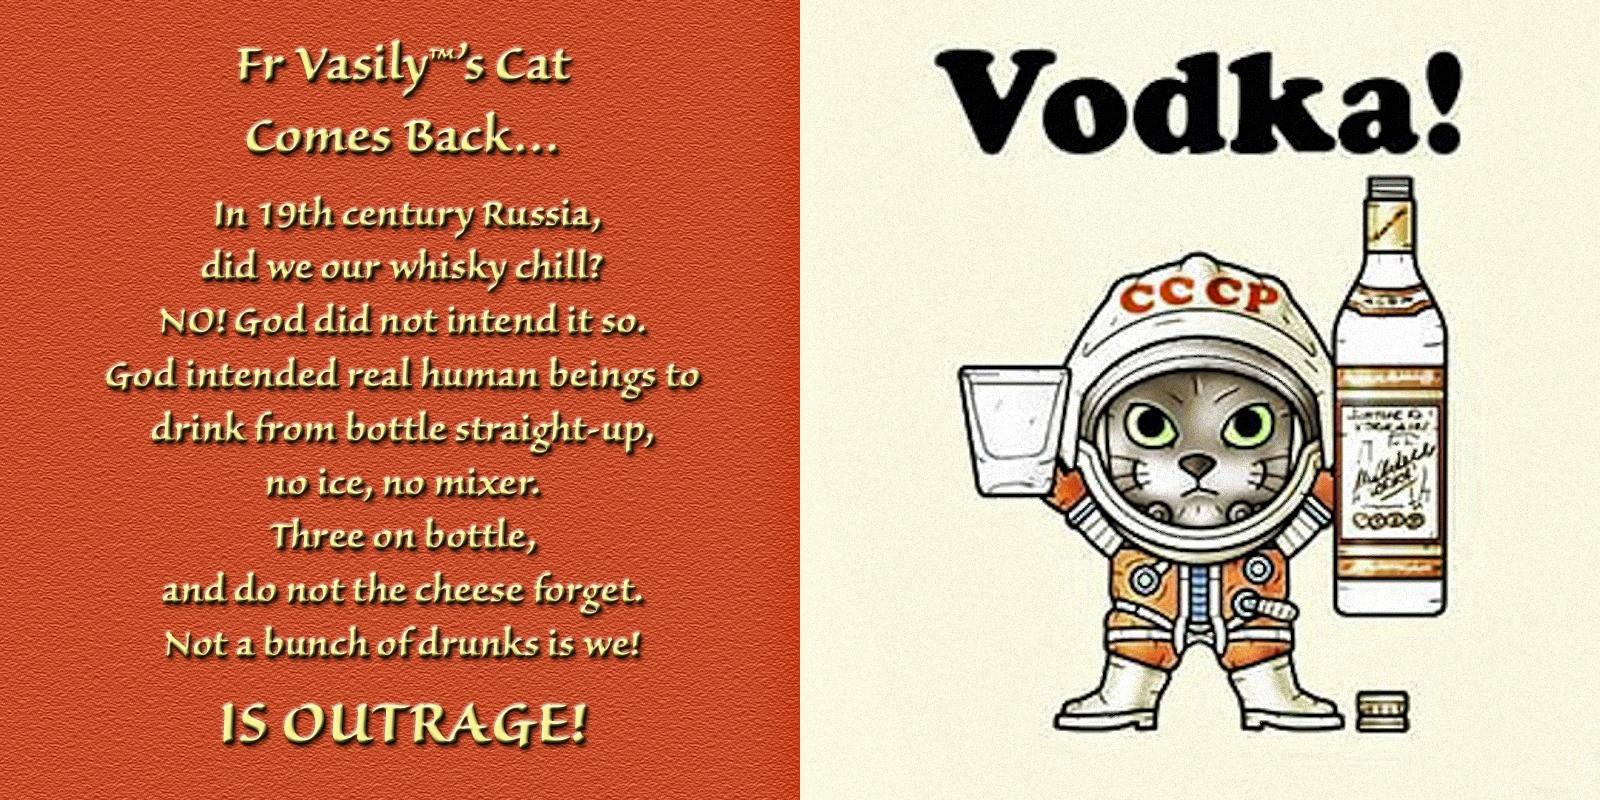 00 fr vasily's cat 231015